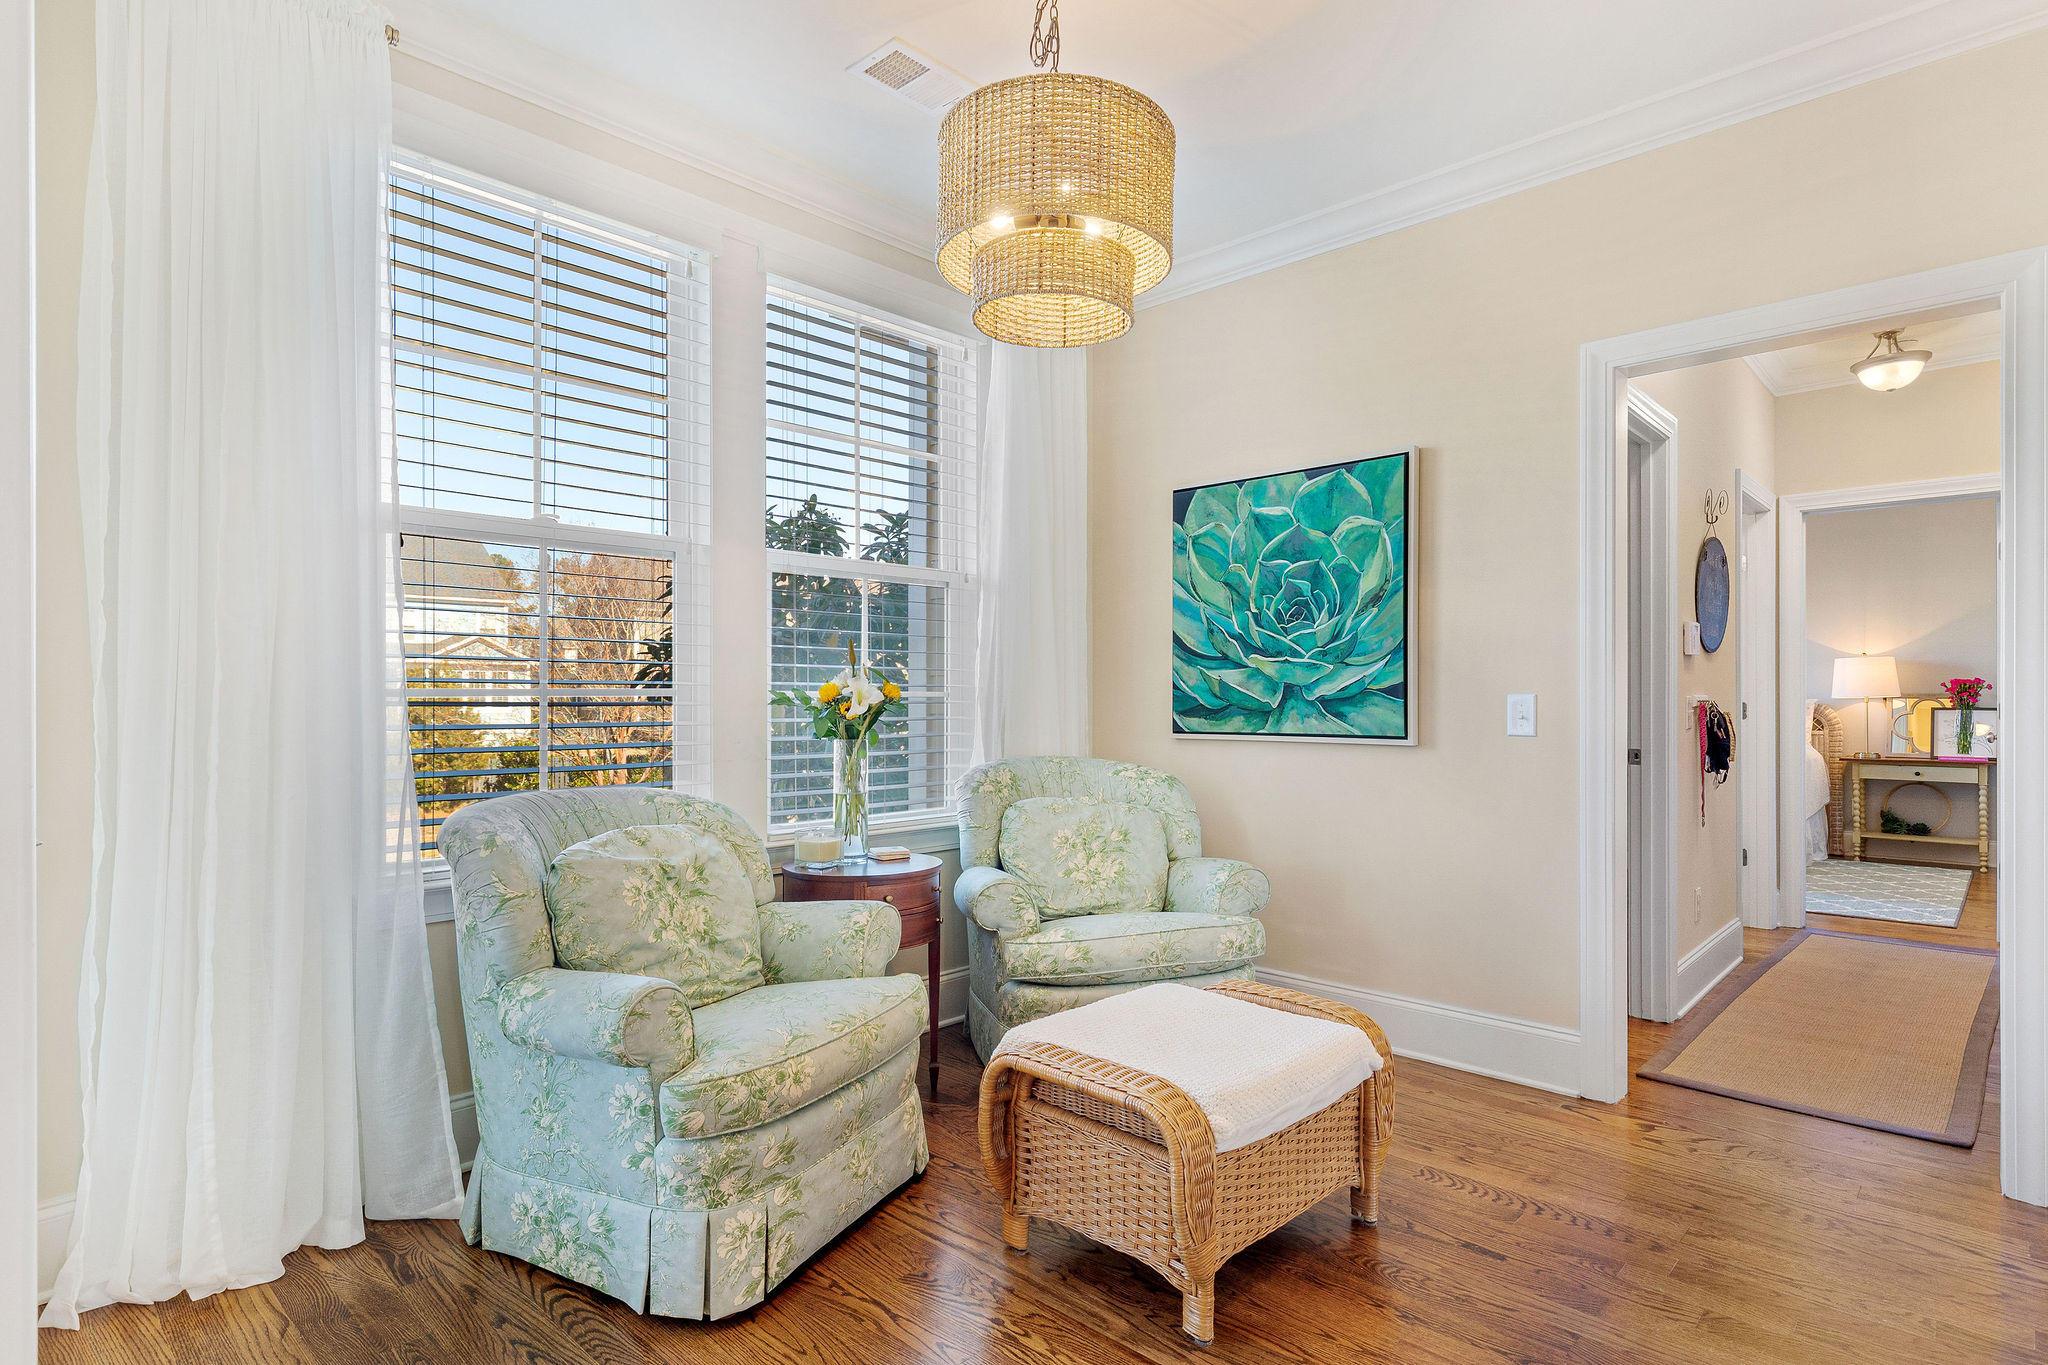 Dunes West Homes For Sale - 3212 Hatchway, Mount Pleasant, SC - 29